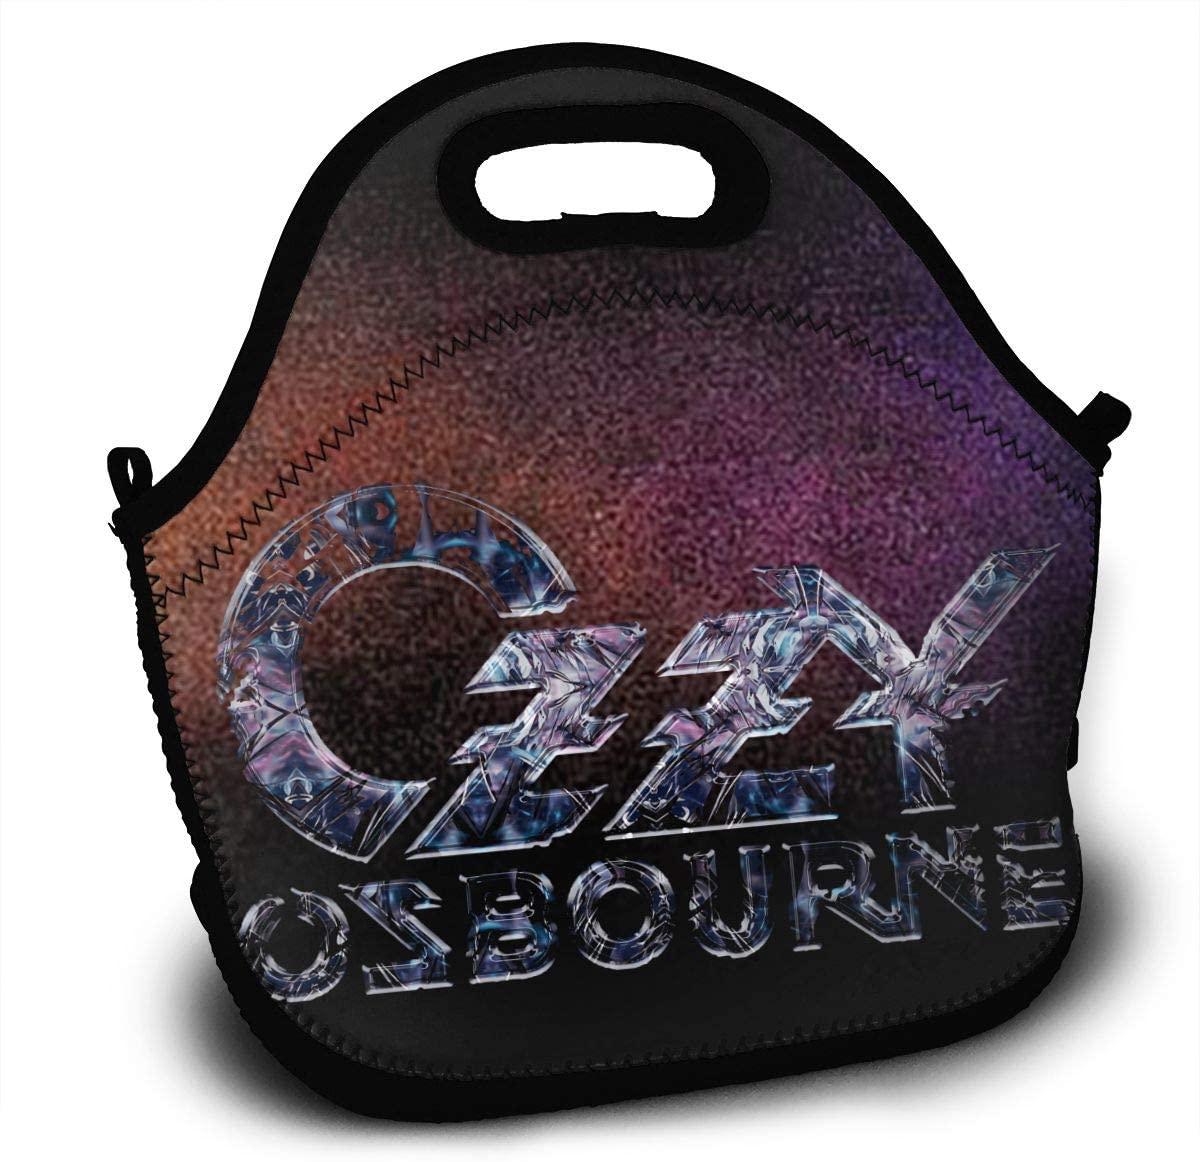 Gjfauehf Ozzy Lunch Box, Handbag, Lunch Bag, Large Capacity